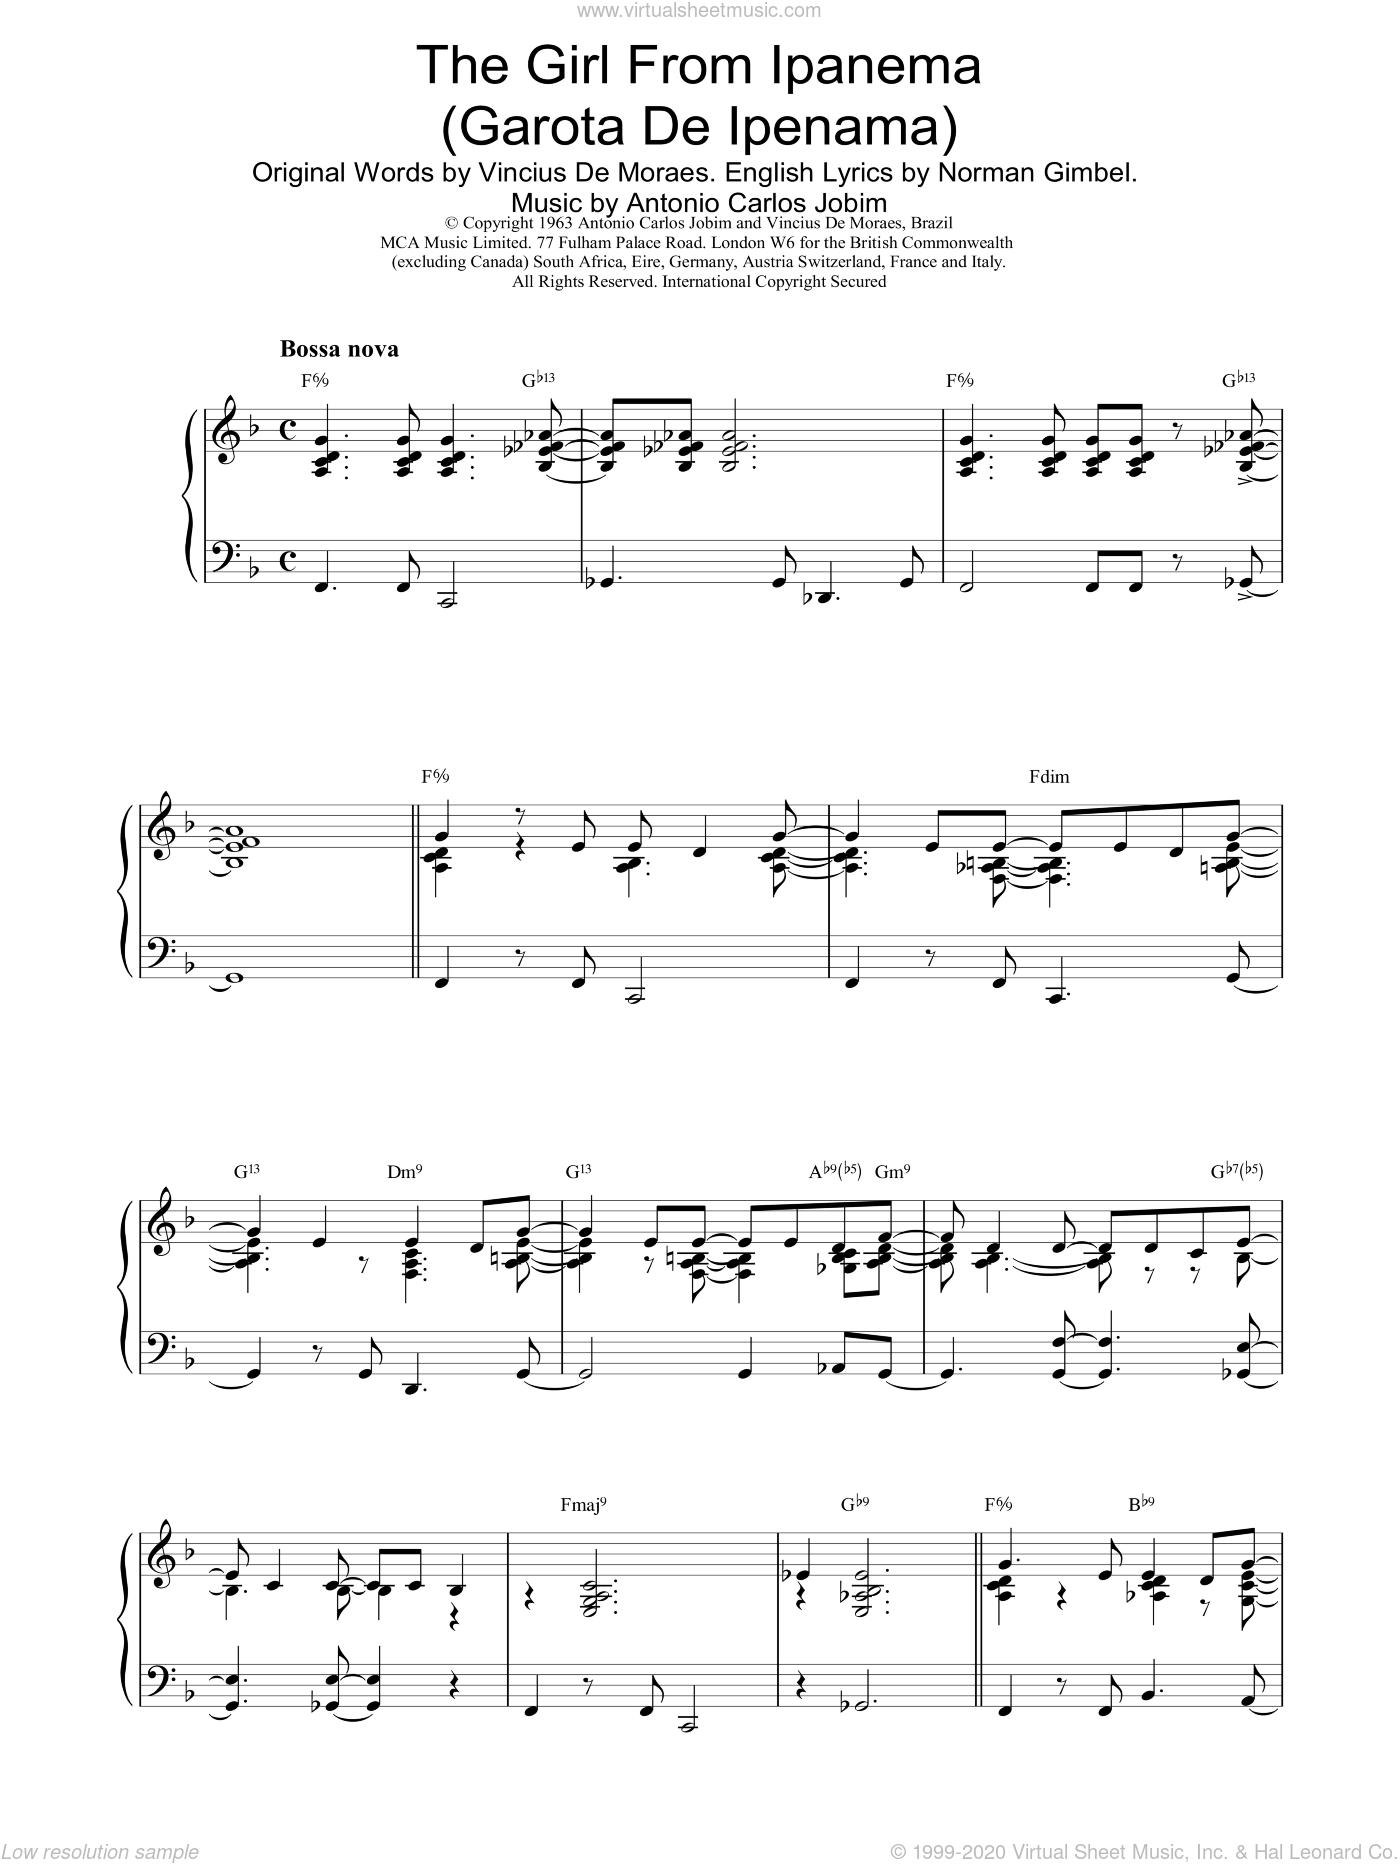 The Girl From Ipanema sheet music for piano solo by Antonio Carlos Jobim, intermediate skill level